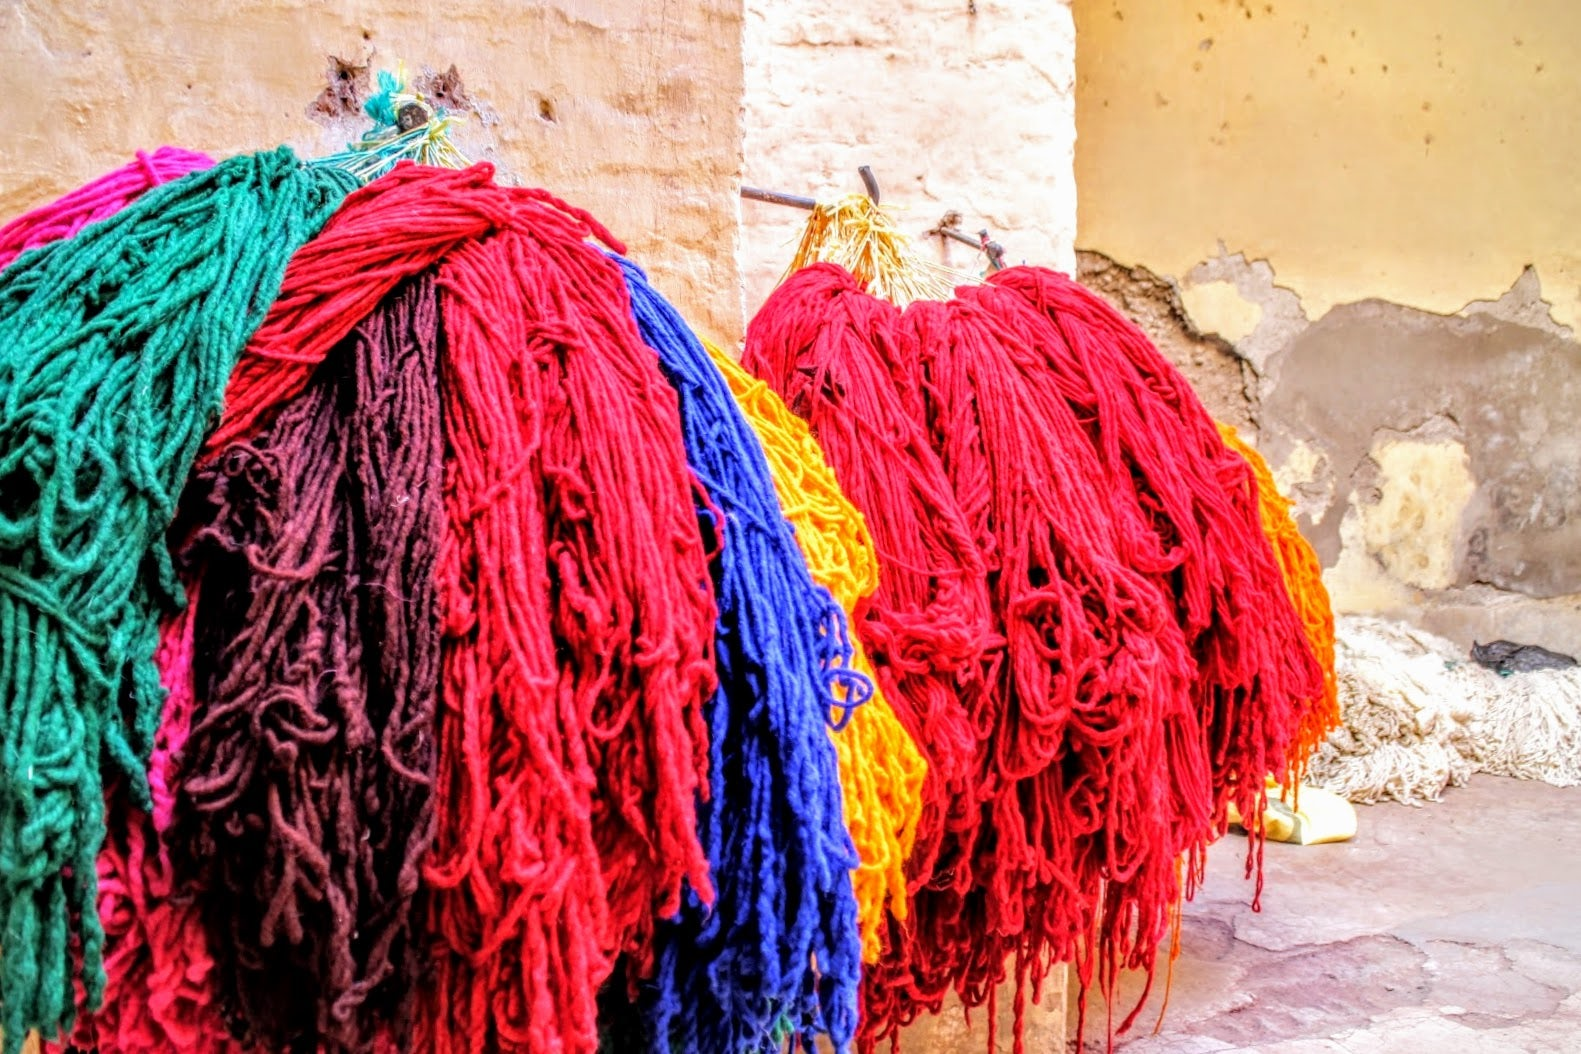 Taming The Magical Maniacal Marrakech Medina